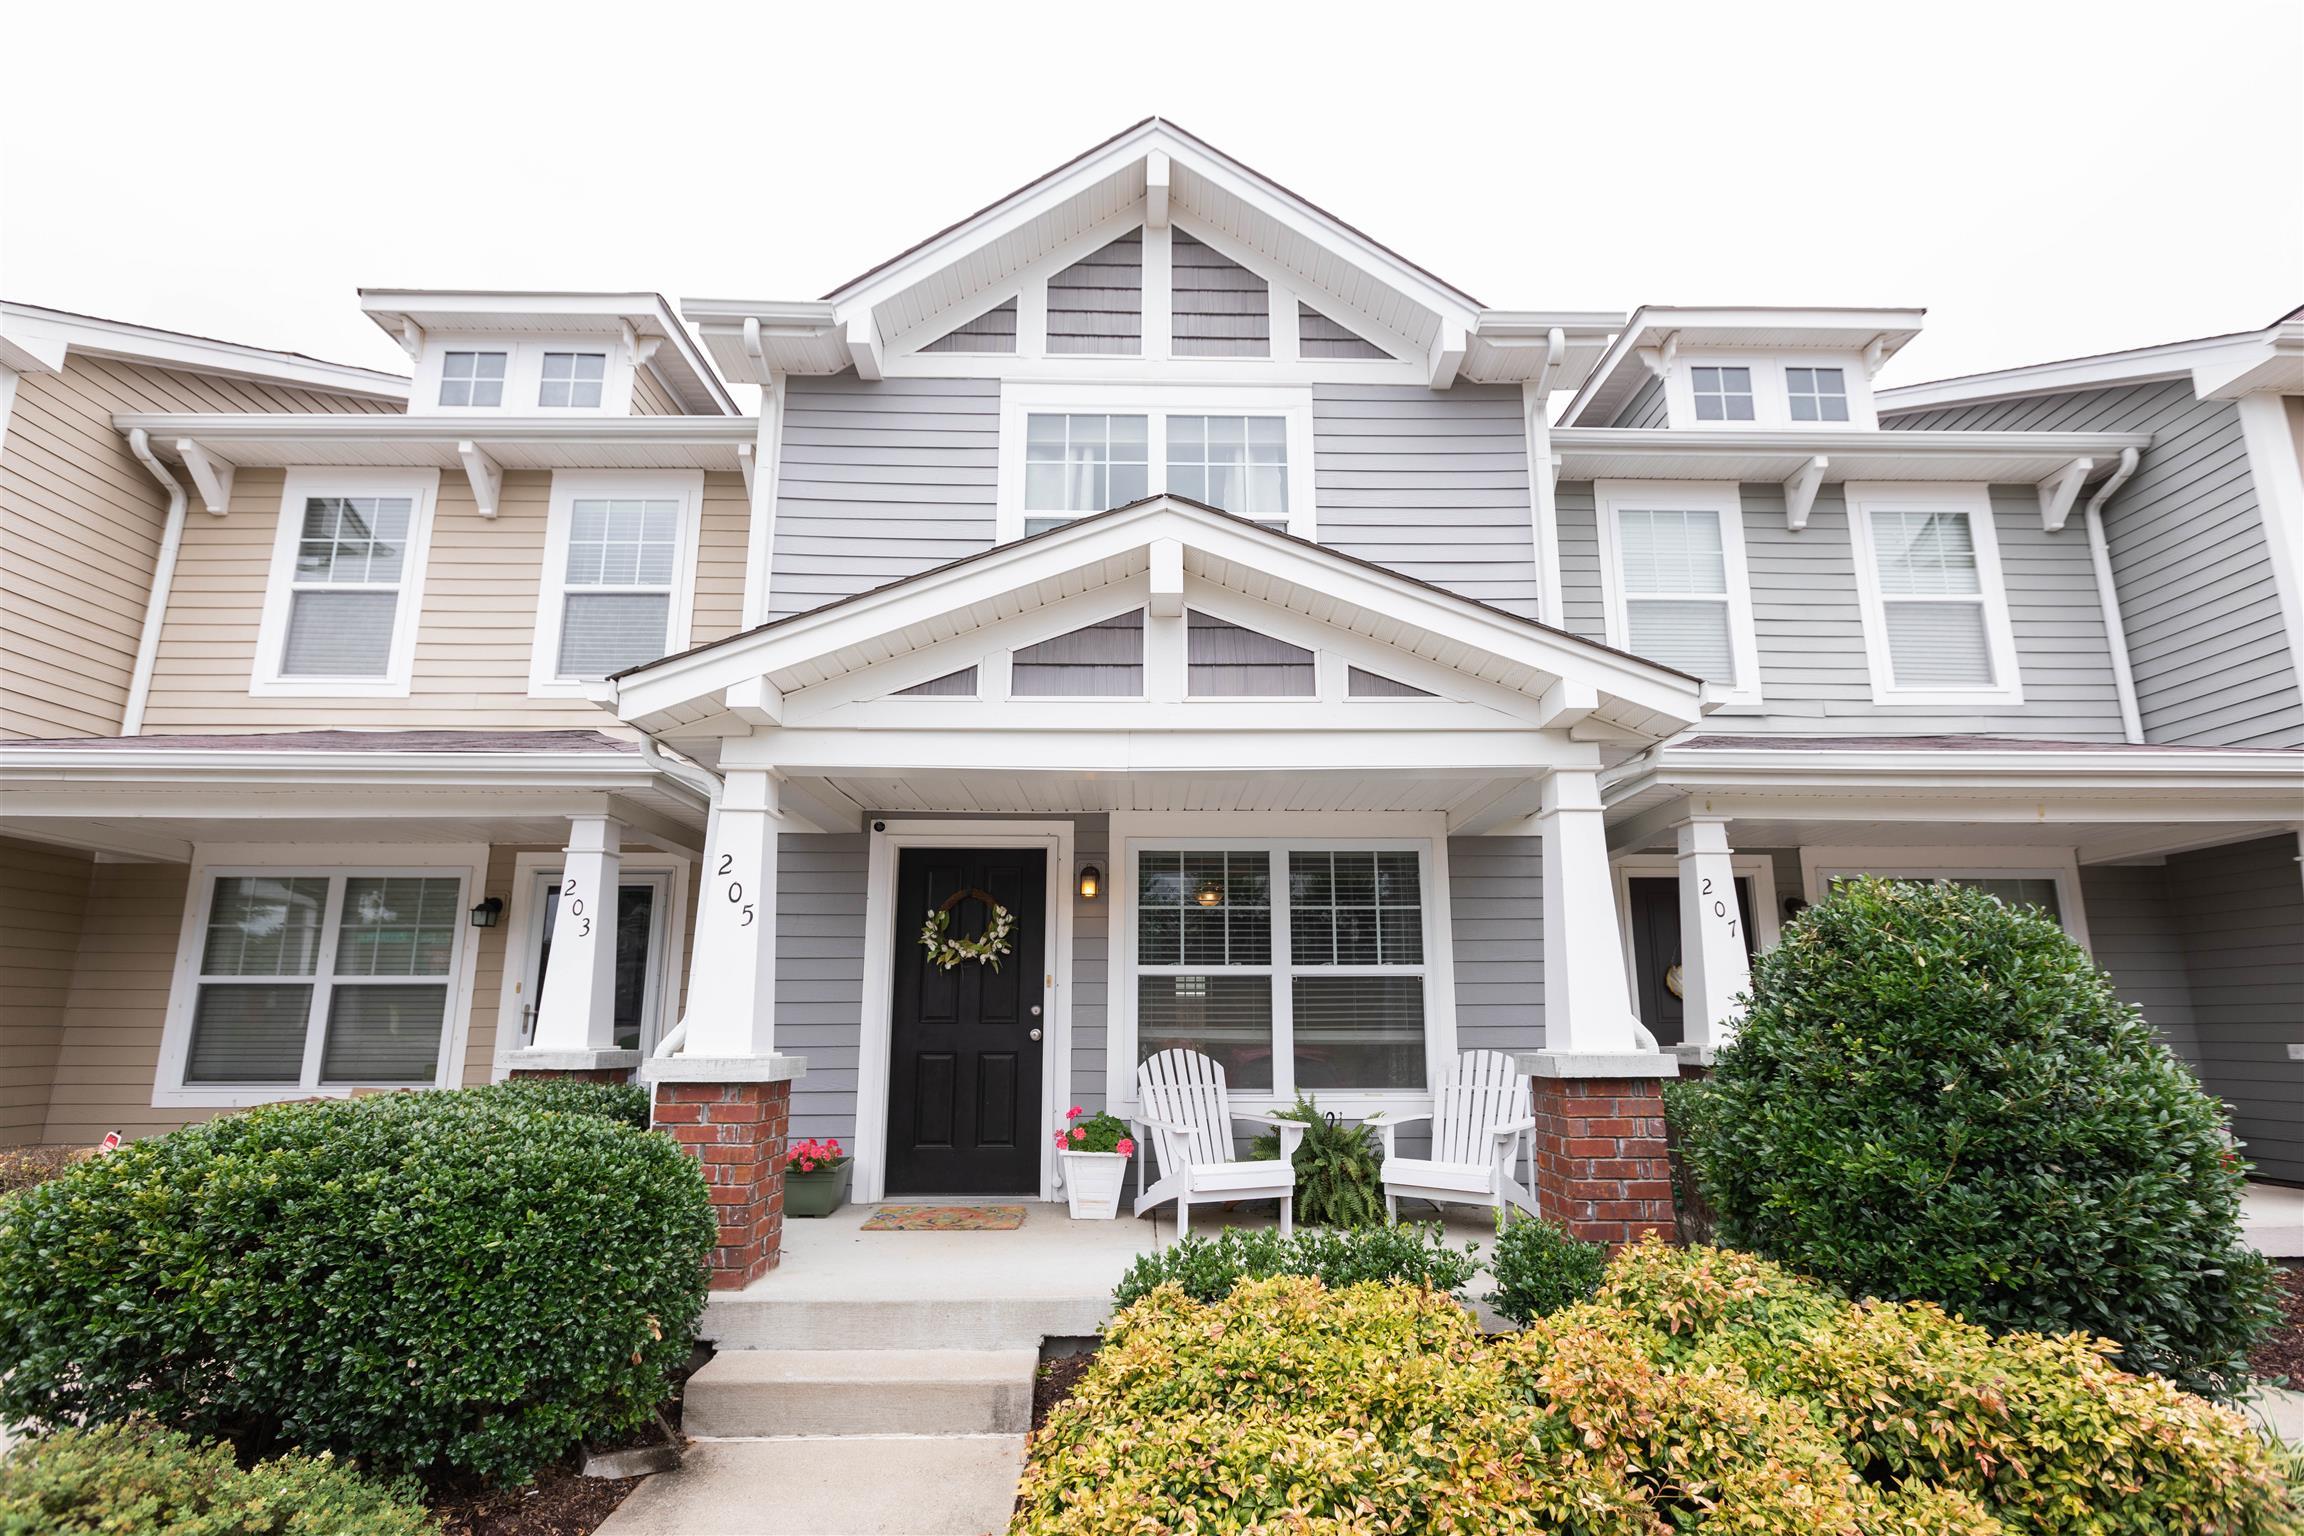 $229,900 - 2Br/3Ba -  for Sale in Providence Ph E, Mount Juliet